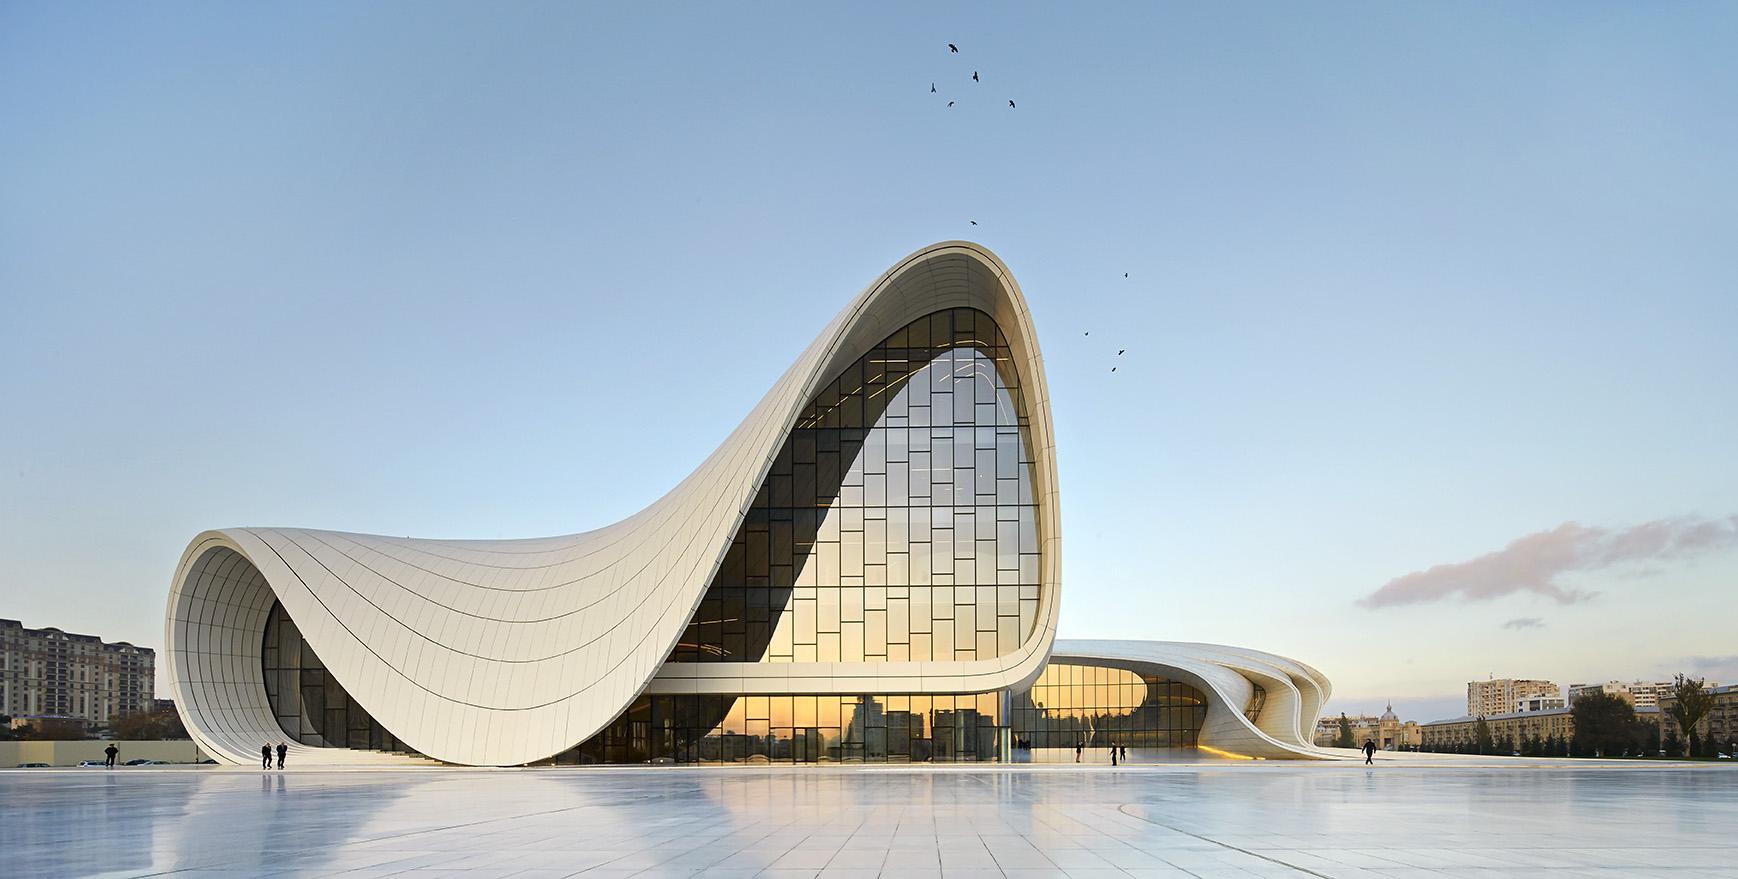 Heydar_Aliyev_Center